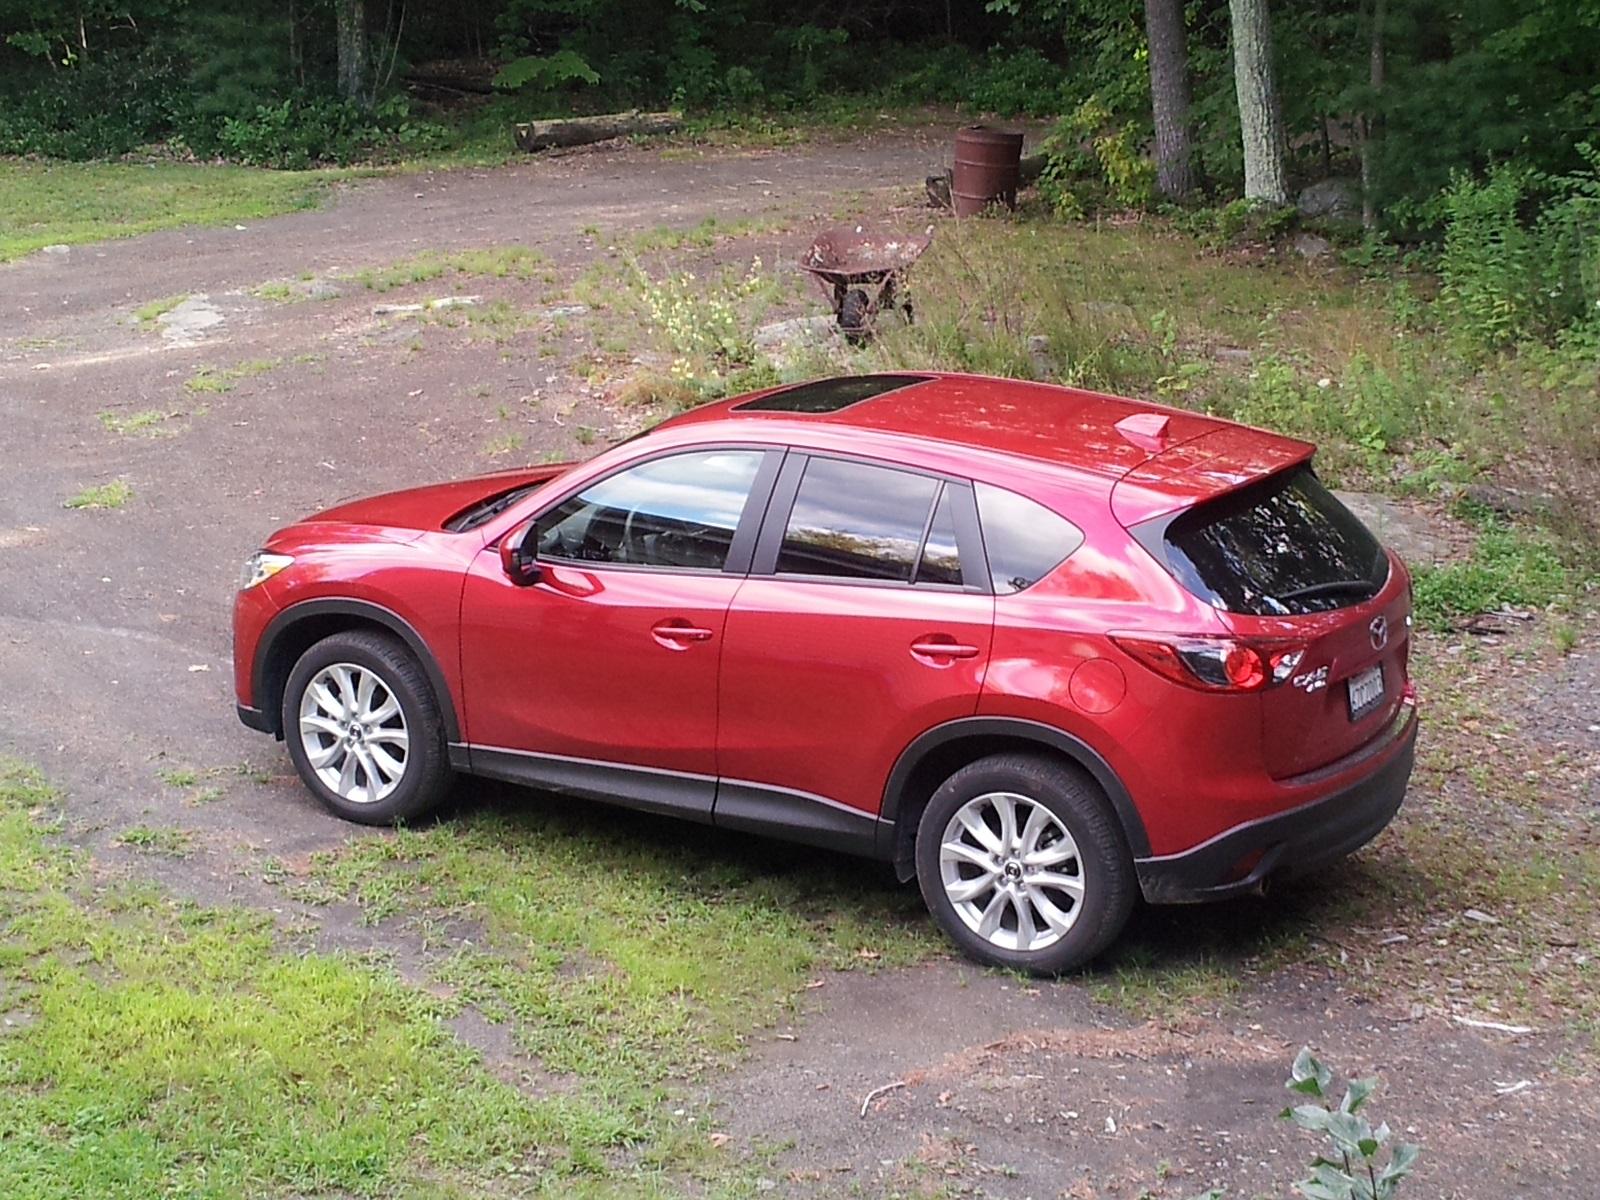 2014 Mazda CX-5 2.5-liter SkyActiv: Gas Mileage Drive Report